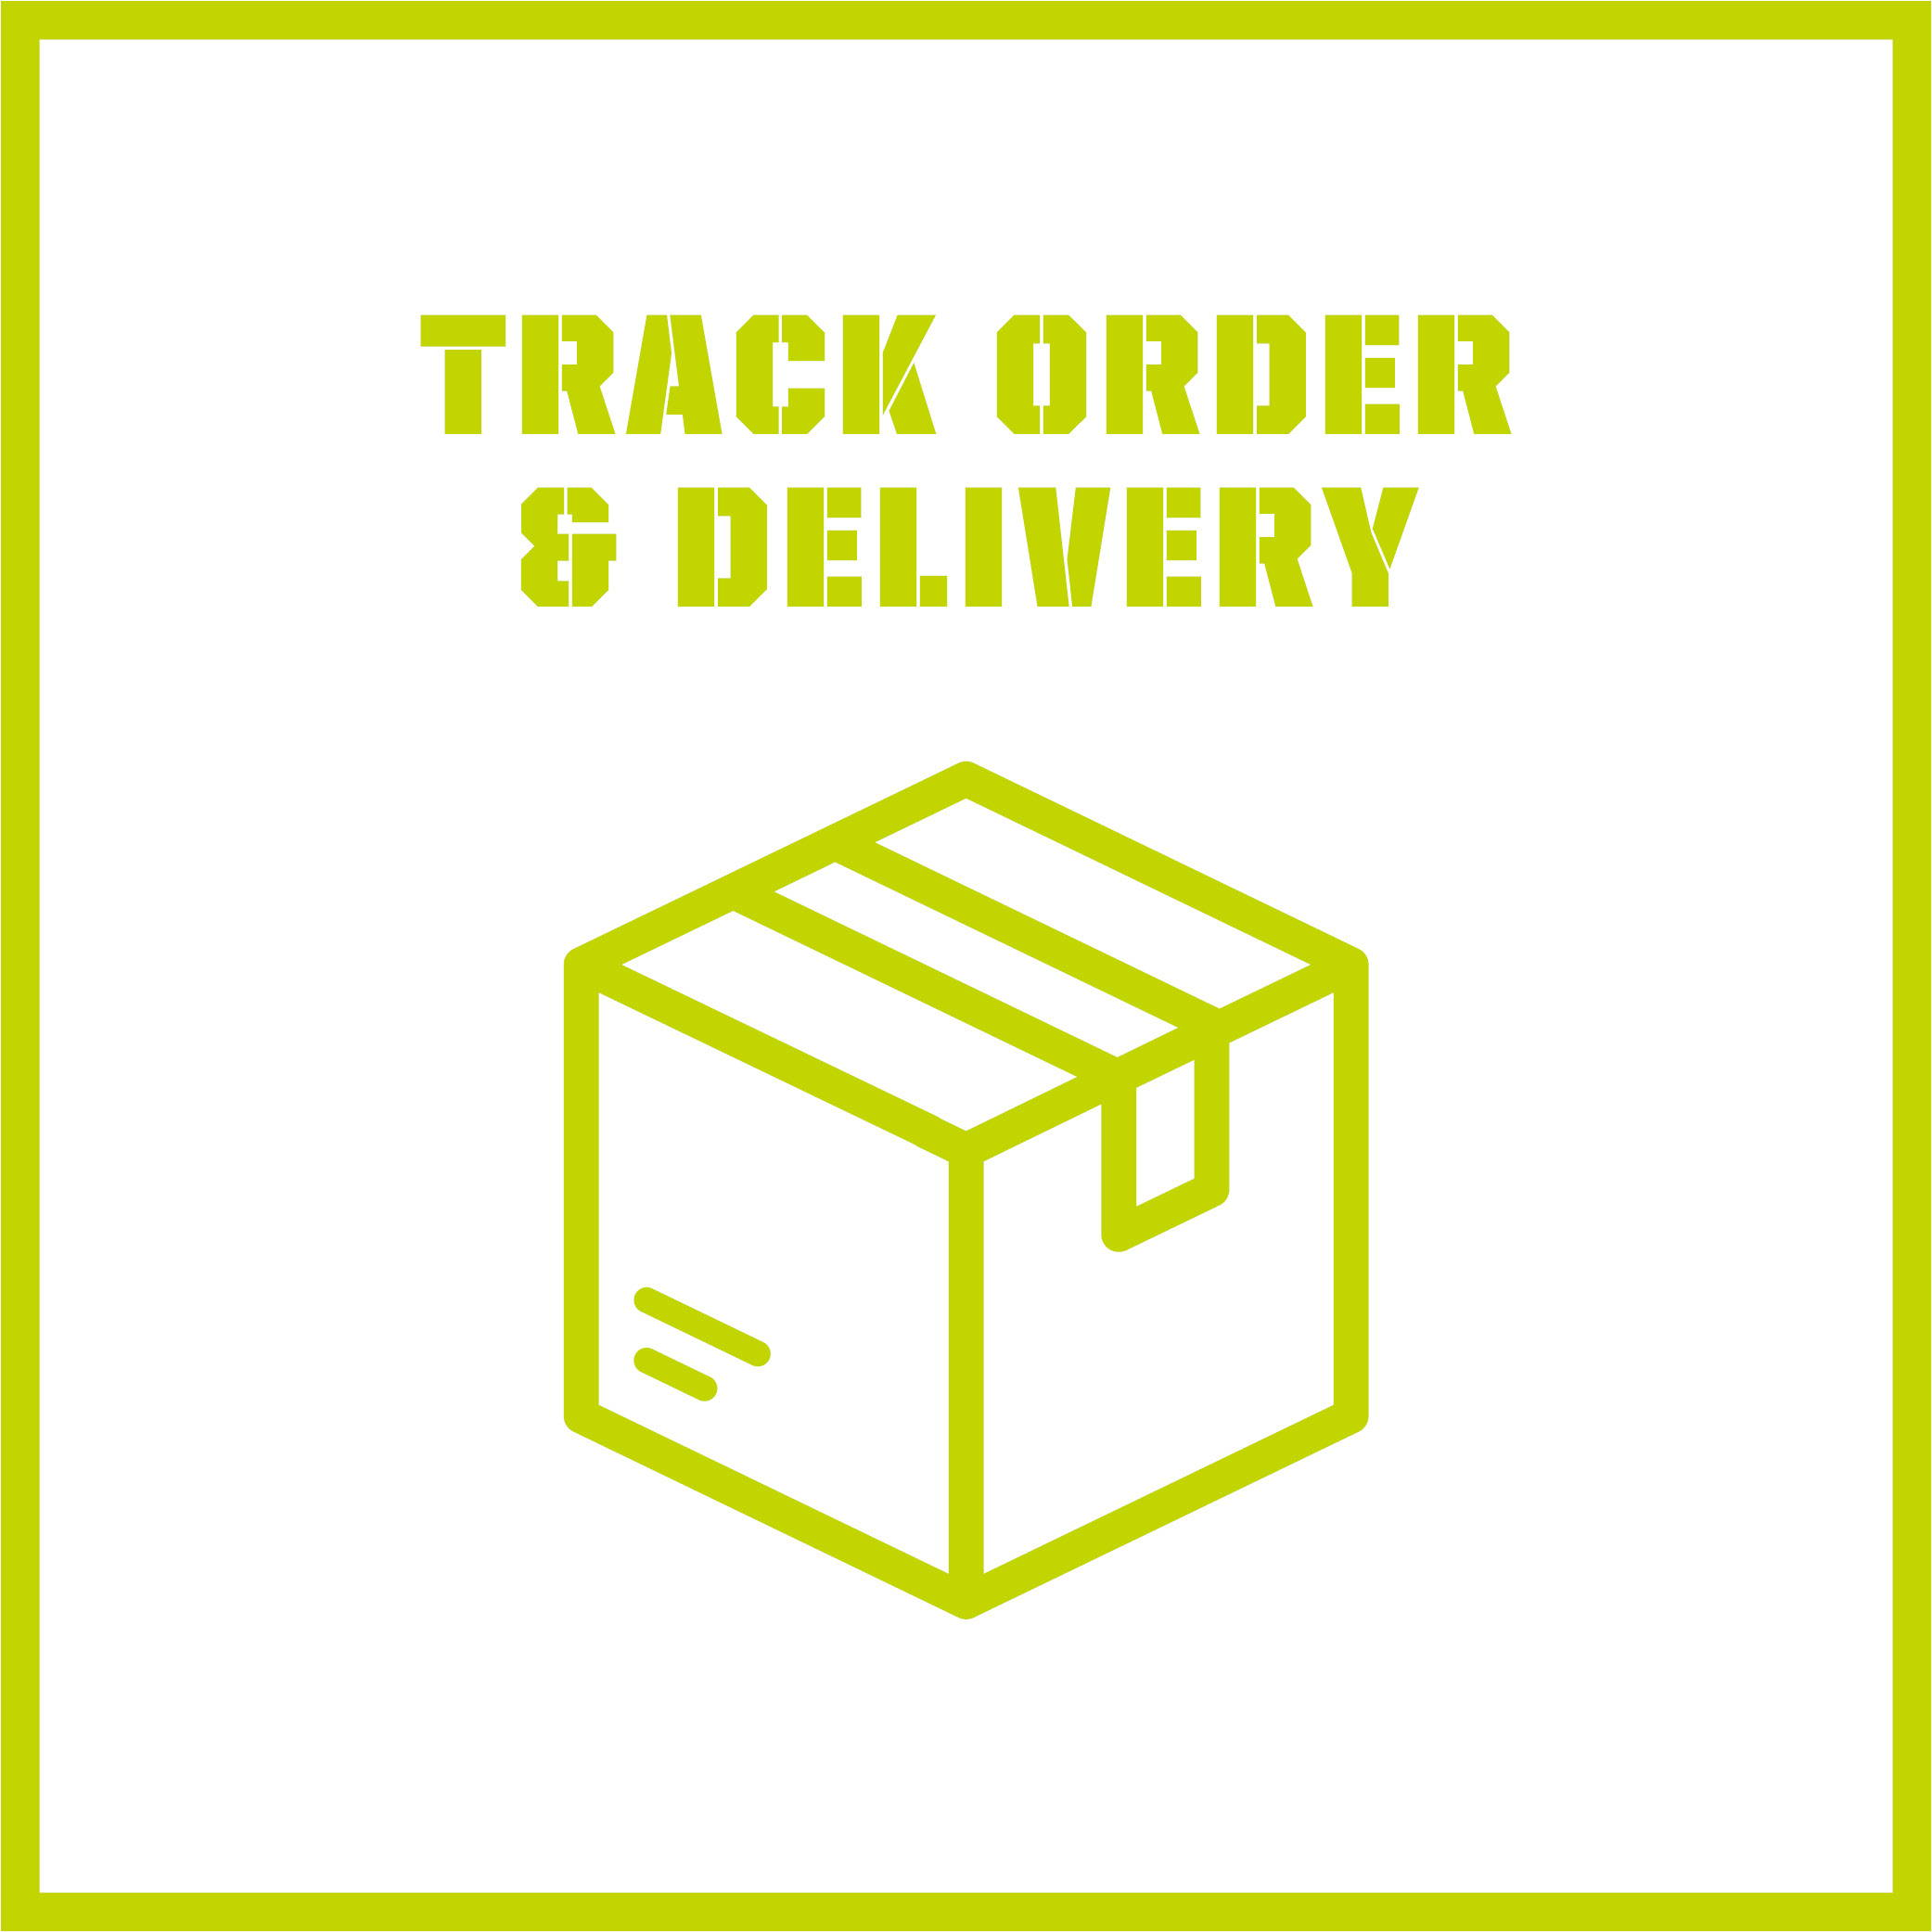 Track order & delivery